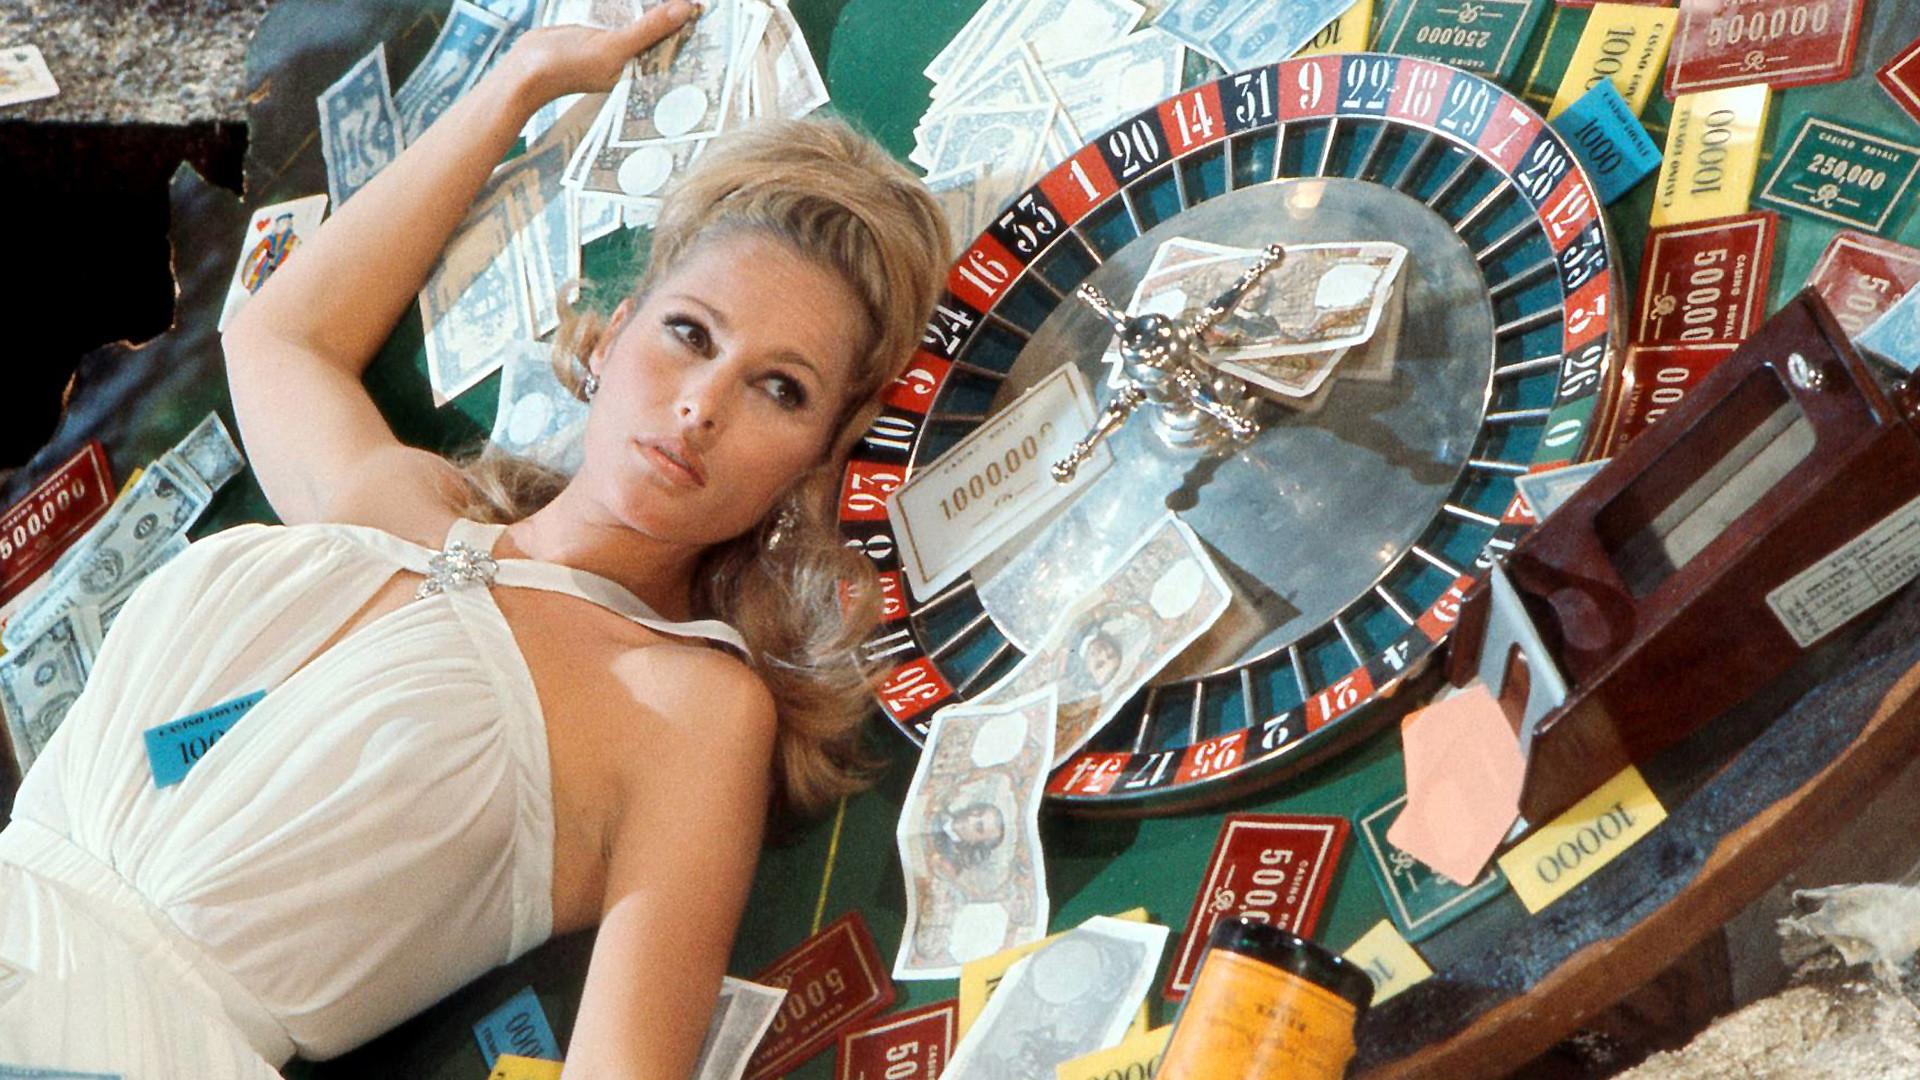 Royal casino mejores alternativos-359201